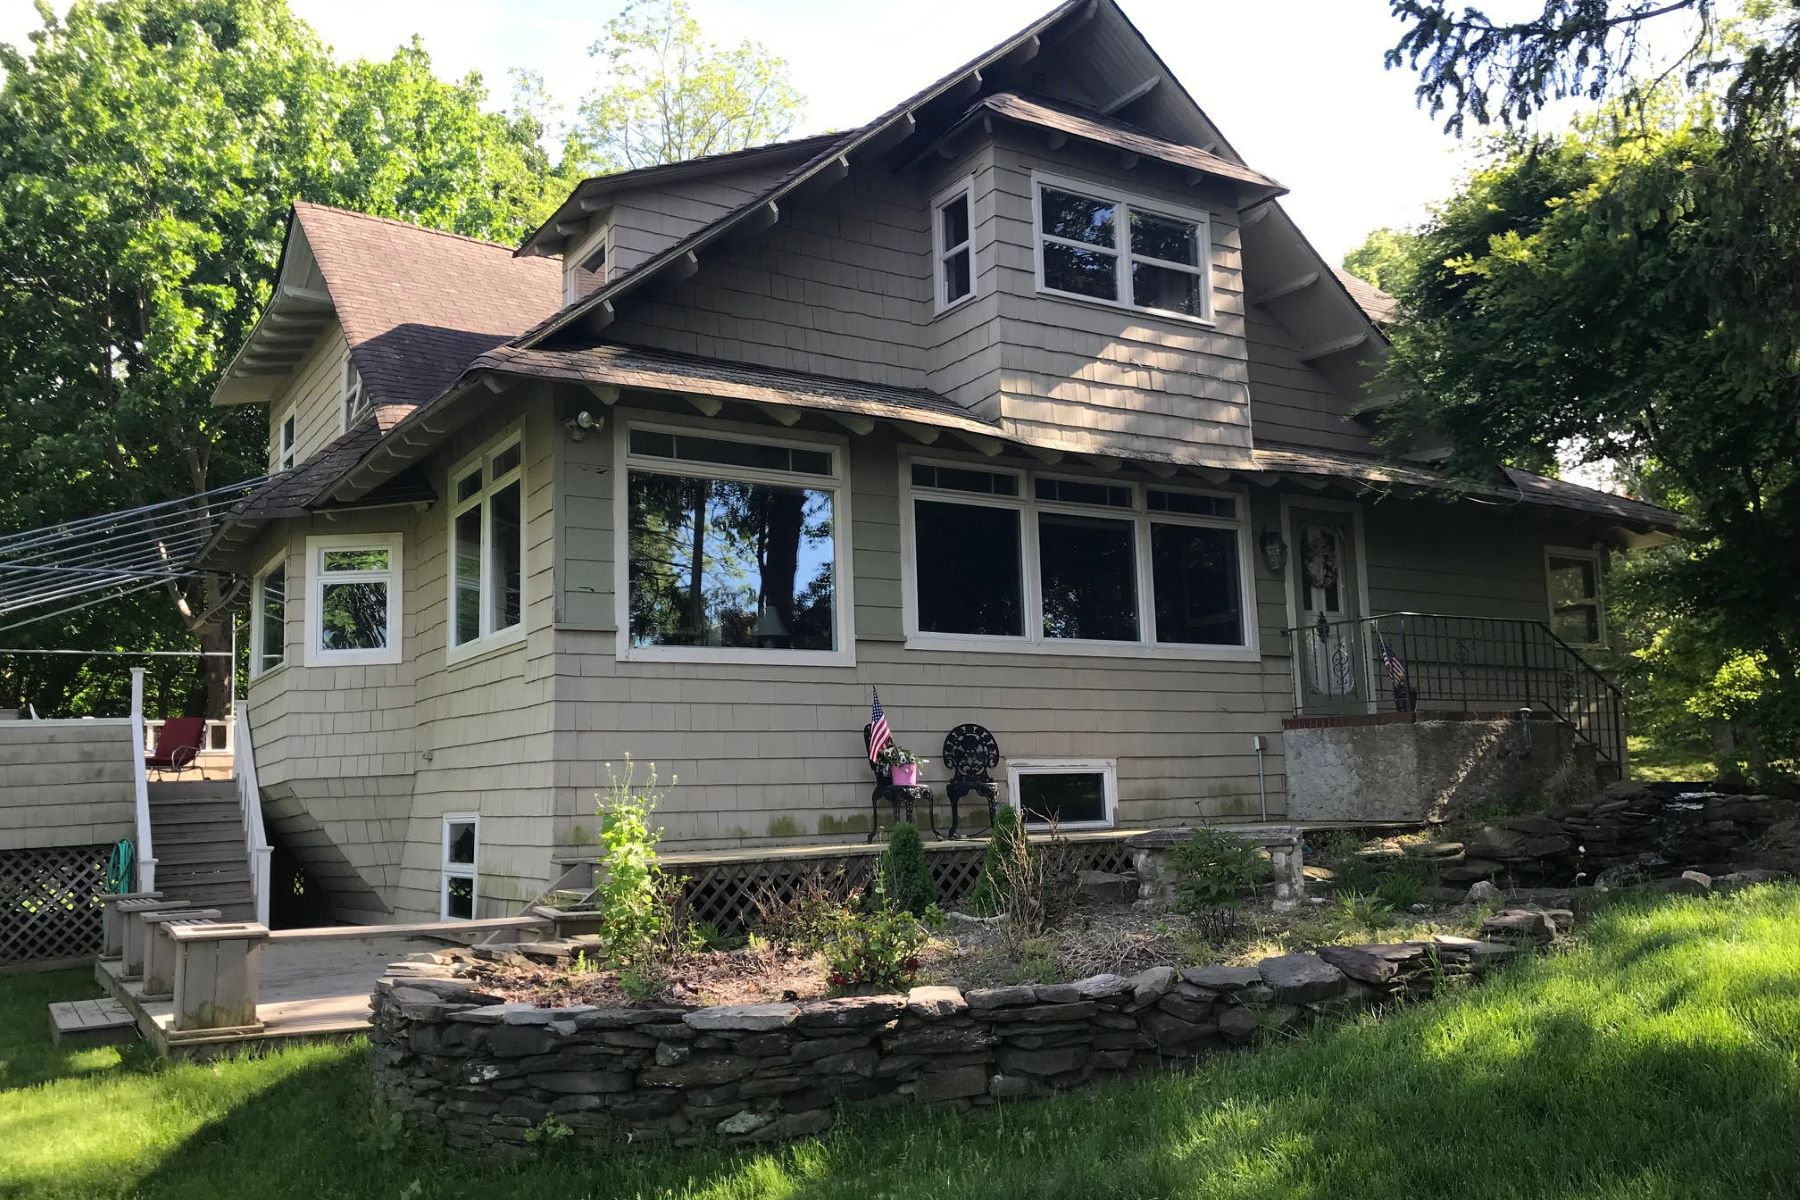 Single Family Homes for Active at Shoreham 16 Wardencliff Rd Shoreham, New York 11786 United States